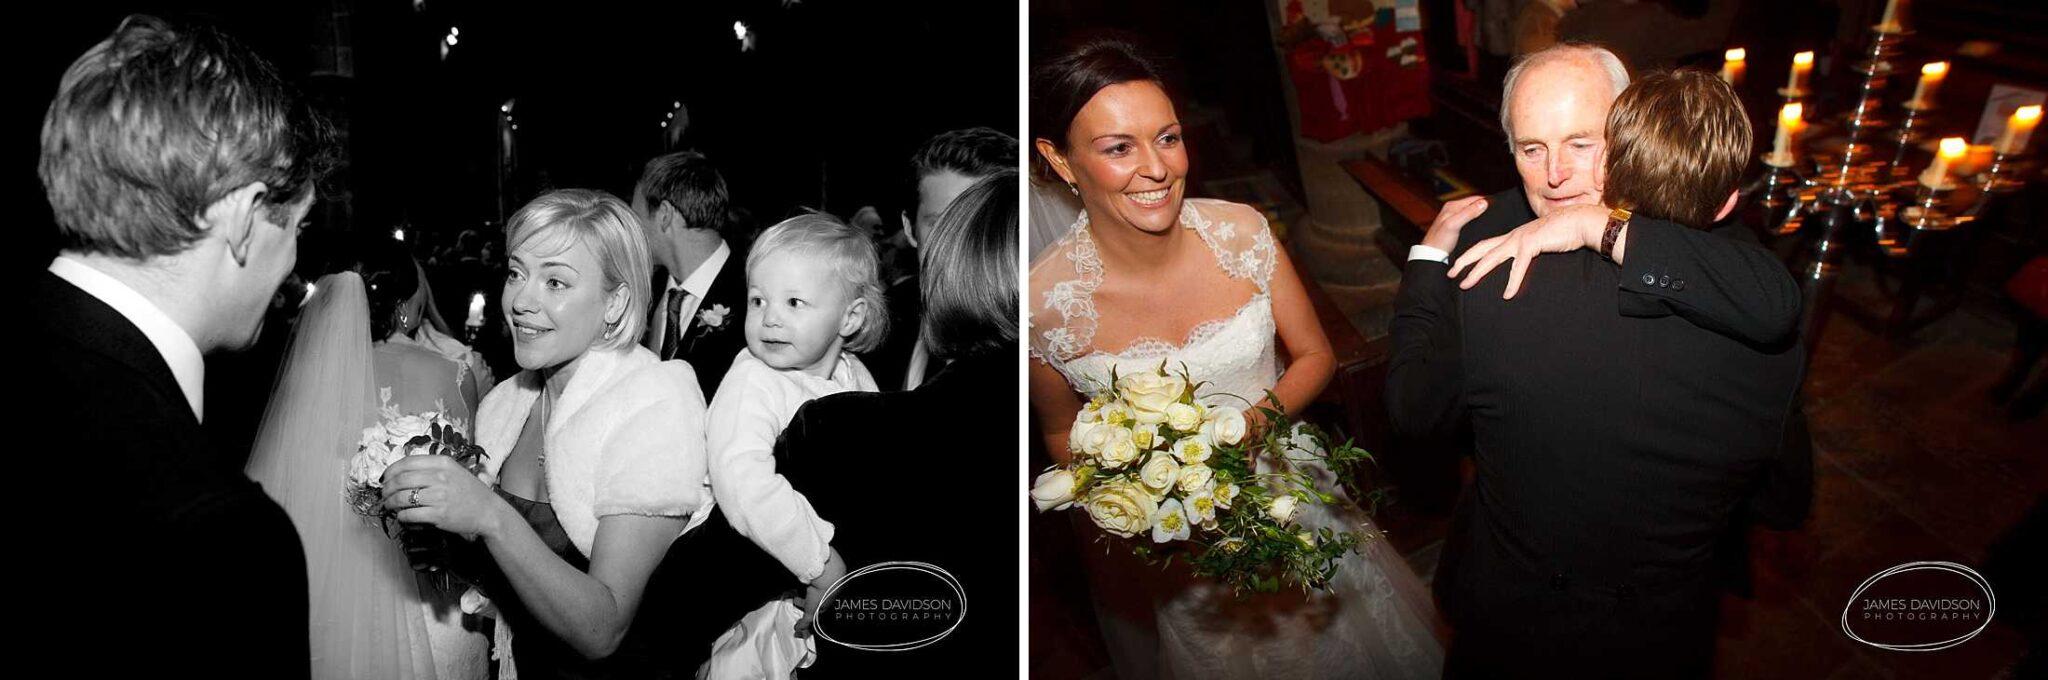 huddersfield-wedding-photography-018